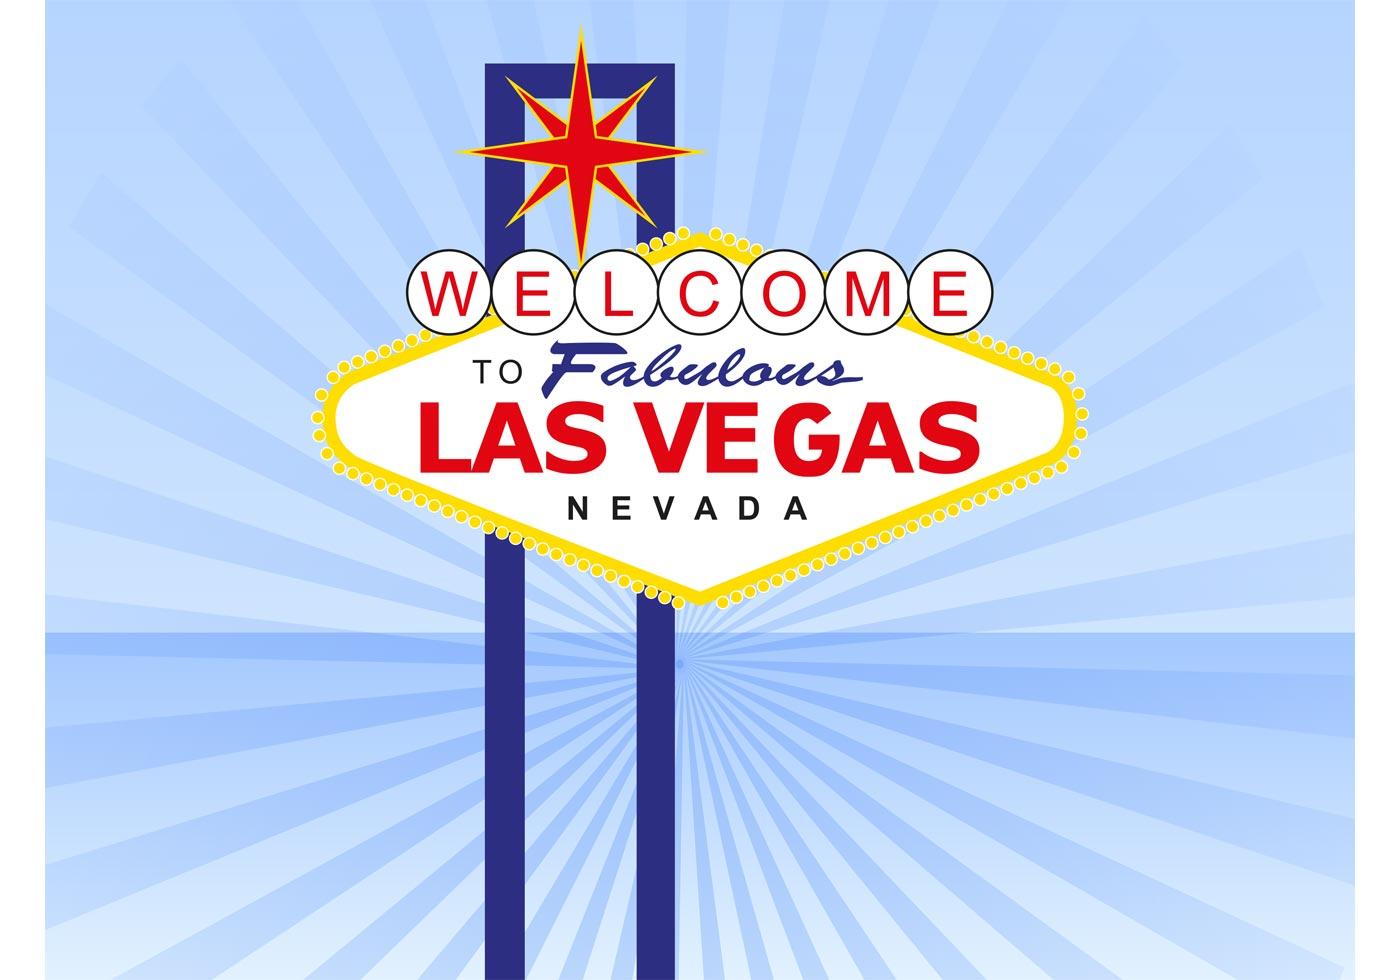 Las Vegas Free Vector Art 53896 Free Downloads